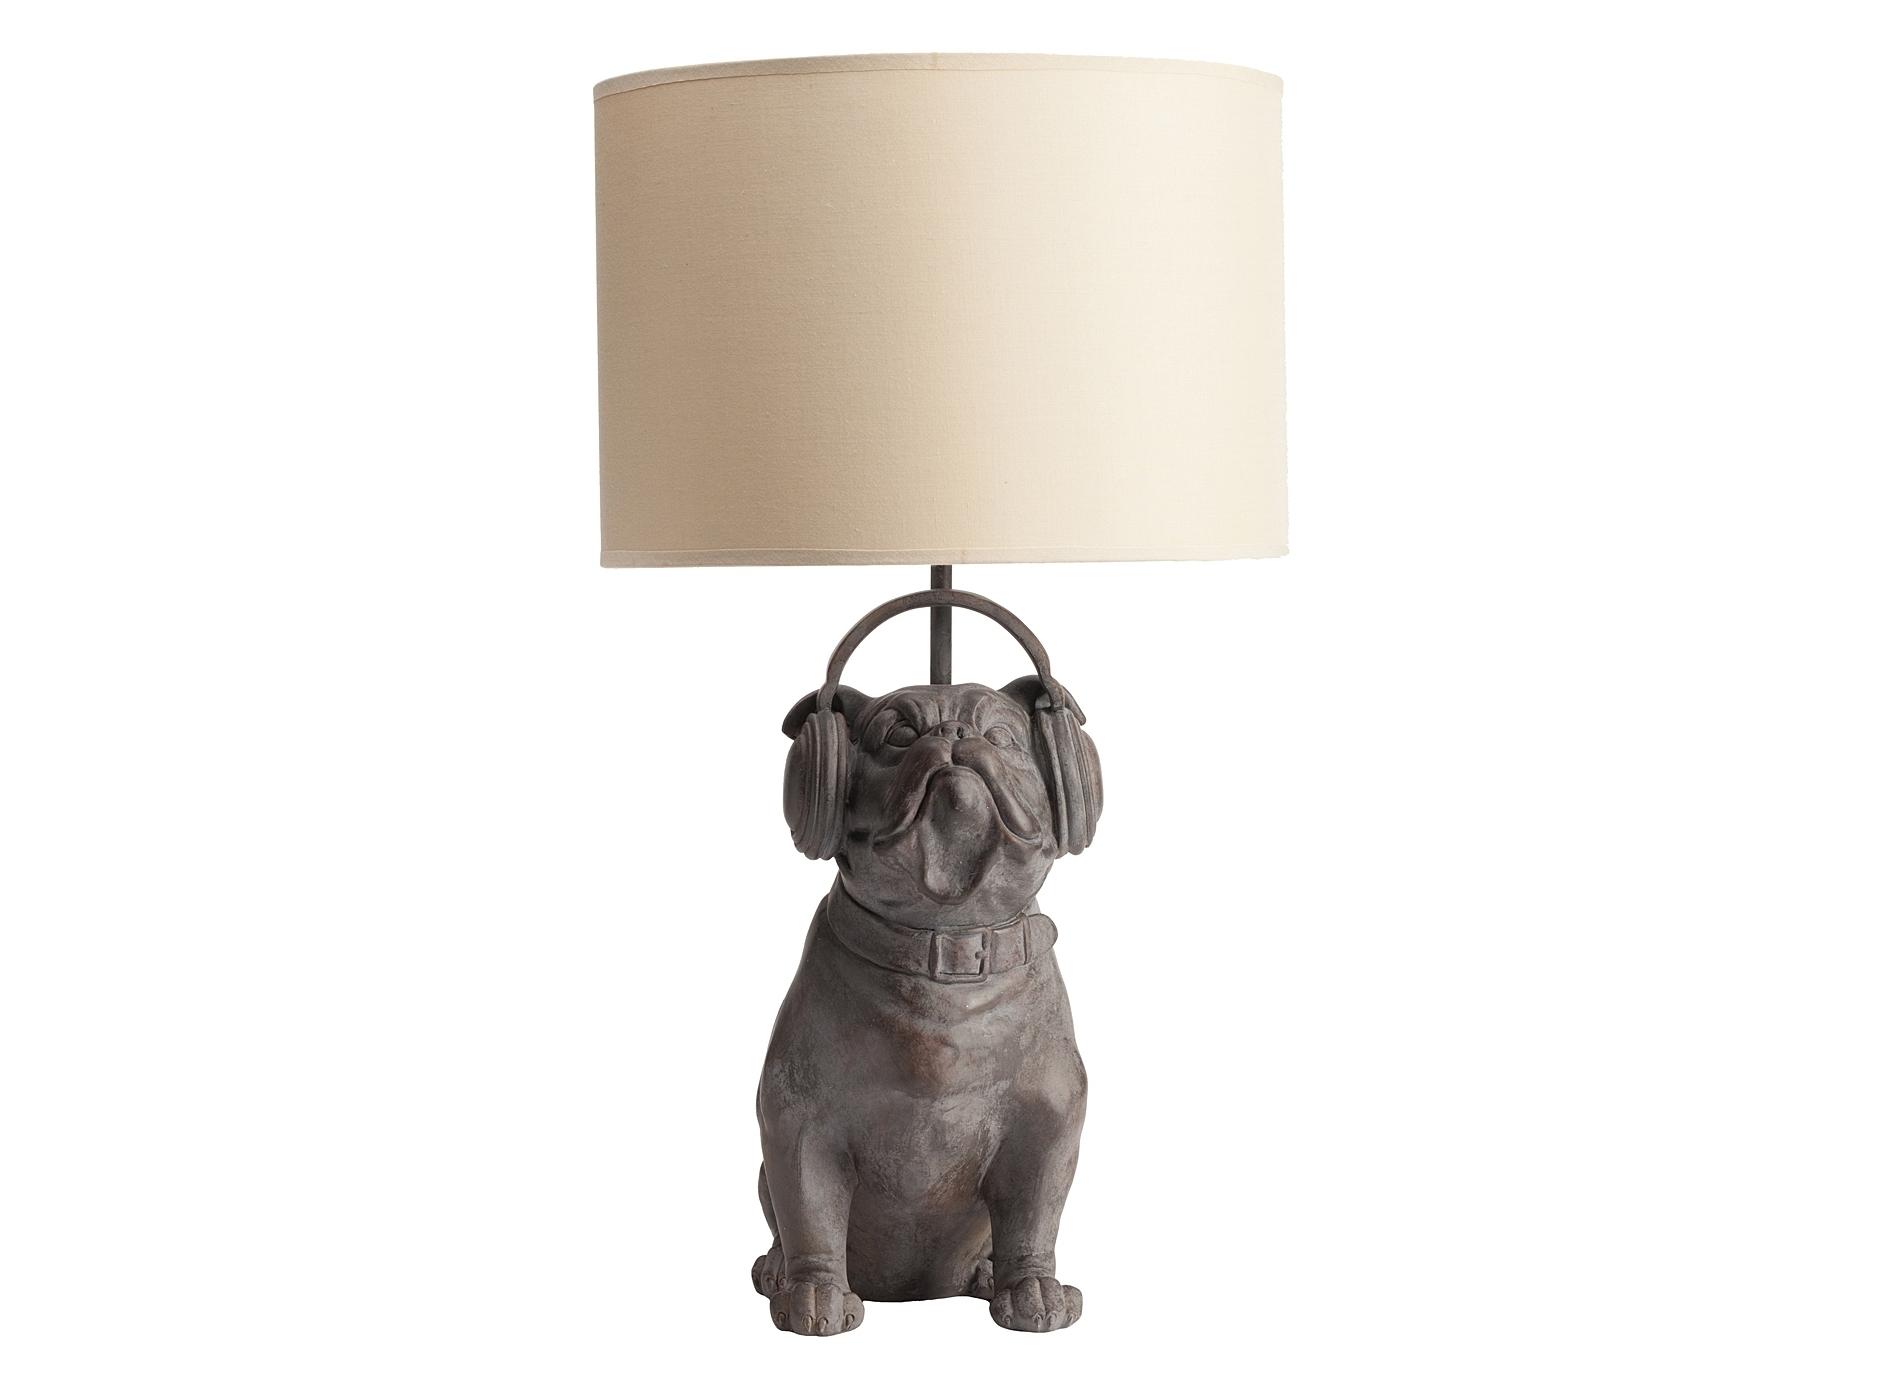 Настольная лампа Bulldog DJДекоративные лампы<br>&amp;lt;div&amp;gt;Вид цоколя: LED&amp;lt;/div&amp;gt;&amp;lt;div&amp;gt;Количество ламп: 1&amp;lt;/div&amp;gt;&amp;lt;div&amp;gt;Мощность: 60W&amp;lt;/div&amp;gt;&amp;lt;div&amp;gt;Максимальная площадь освещения: 4 &amp;amp;nbsp;кв.м.&amp;lt;/div&amp;gt;<br><br>Material: Пластик<br>Width см: 29<br>Depth см: 20<br>Height см: 49